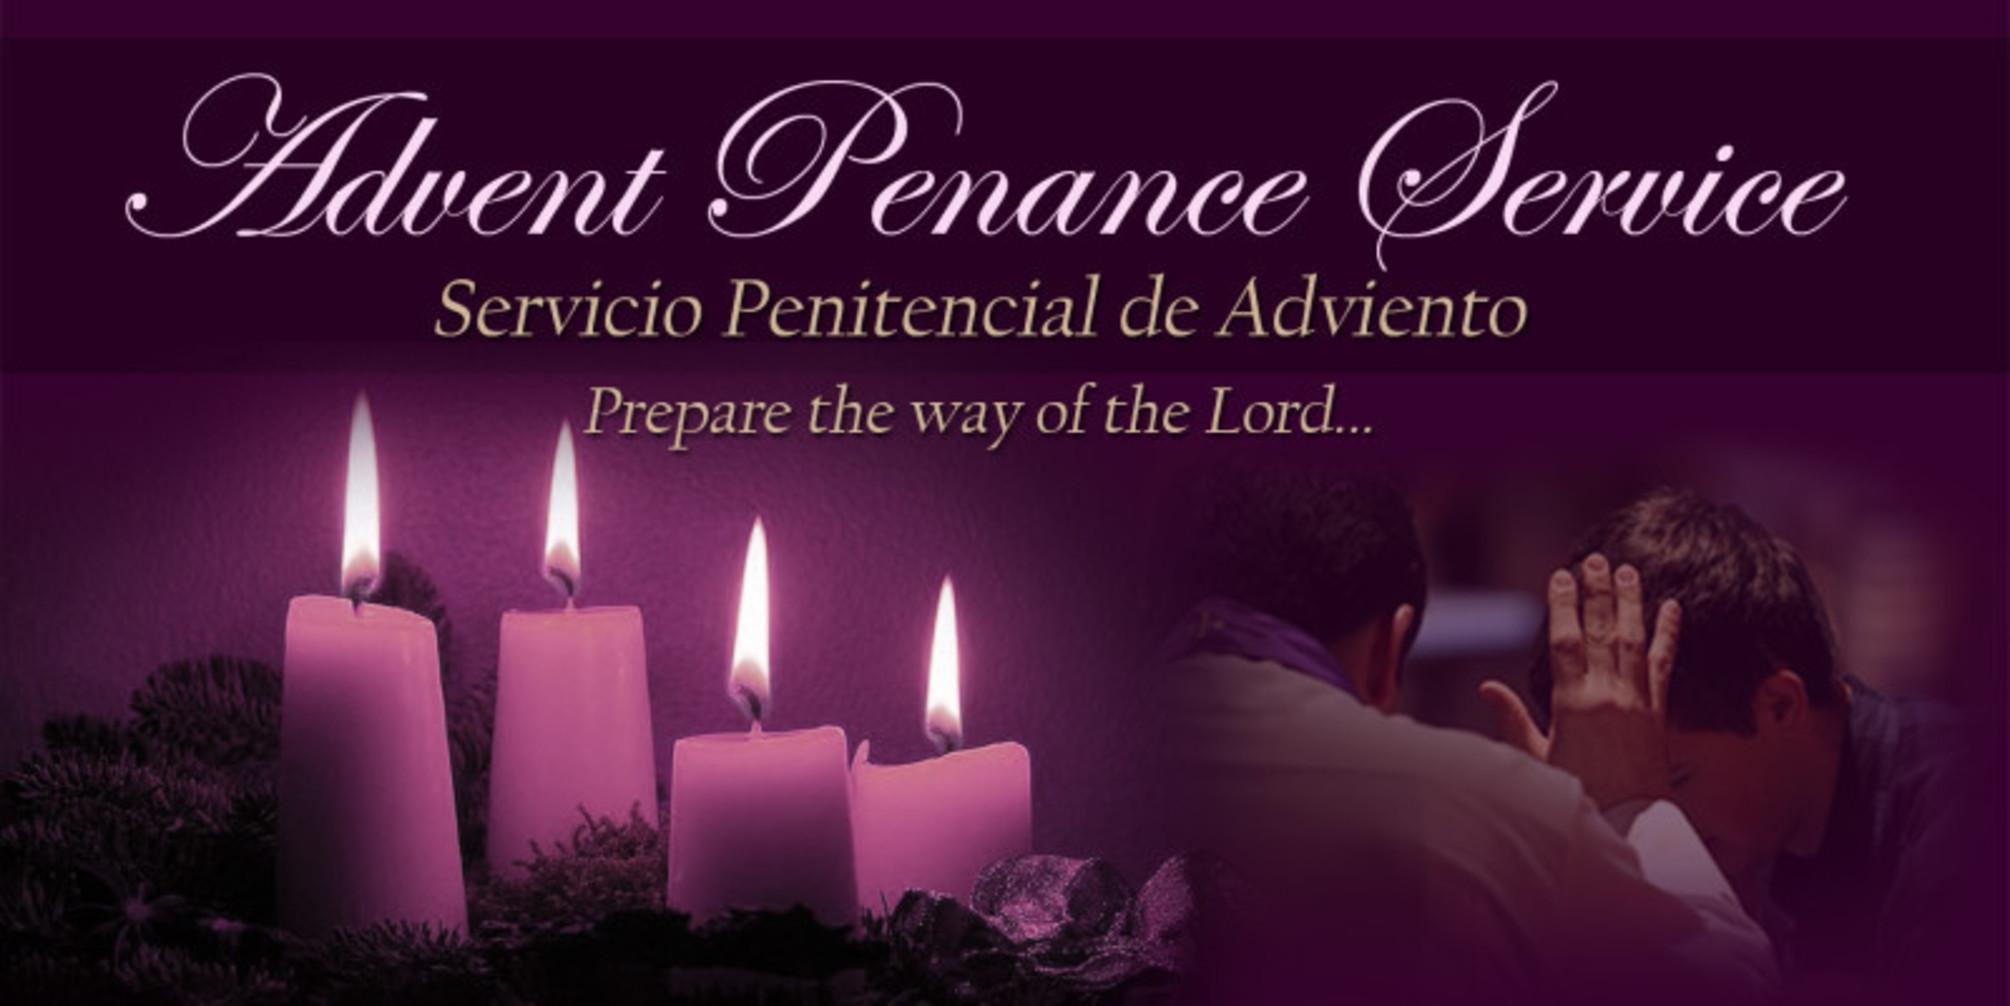 Advent Penance